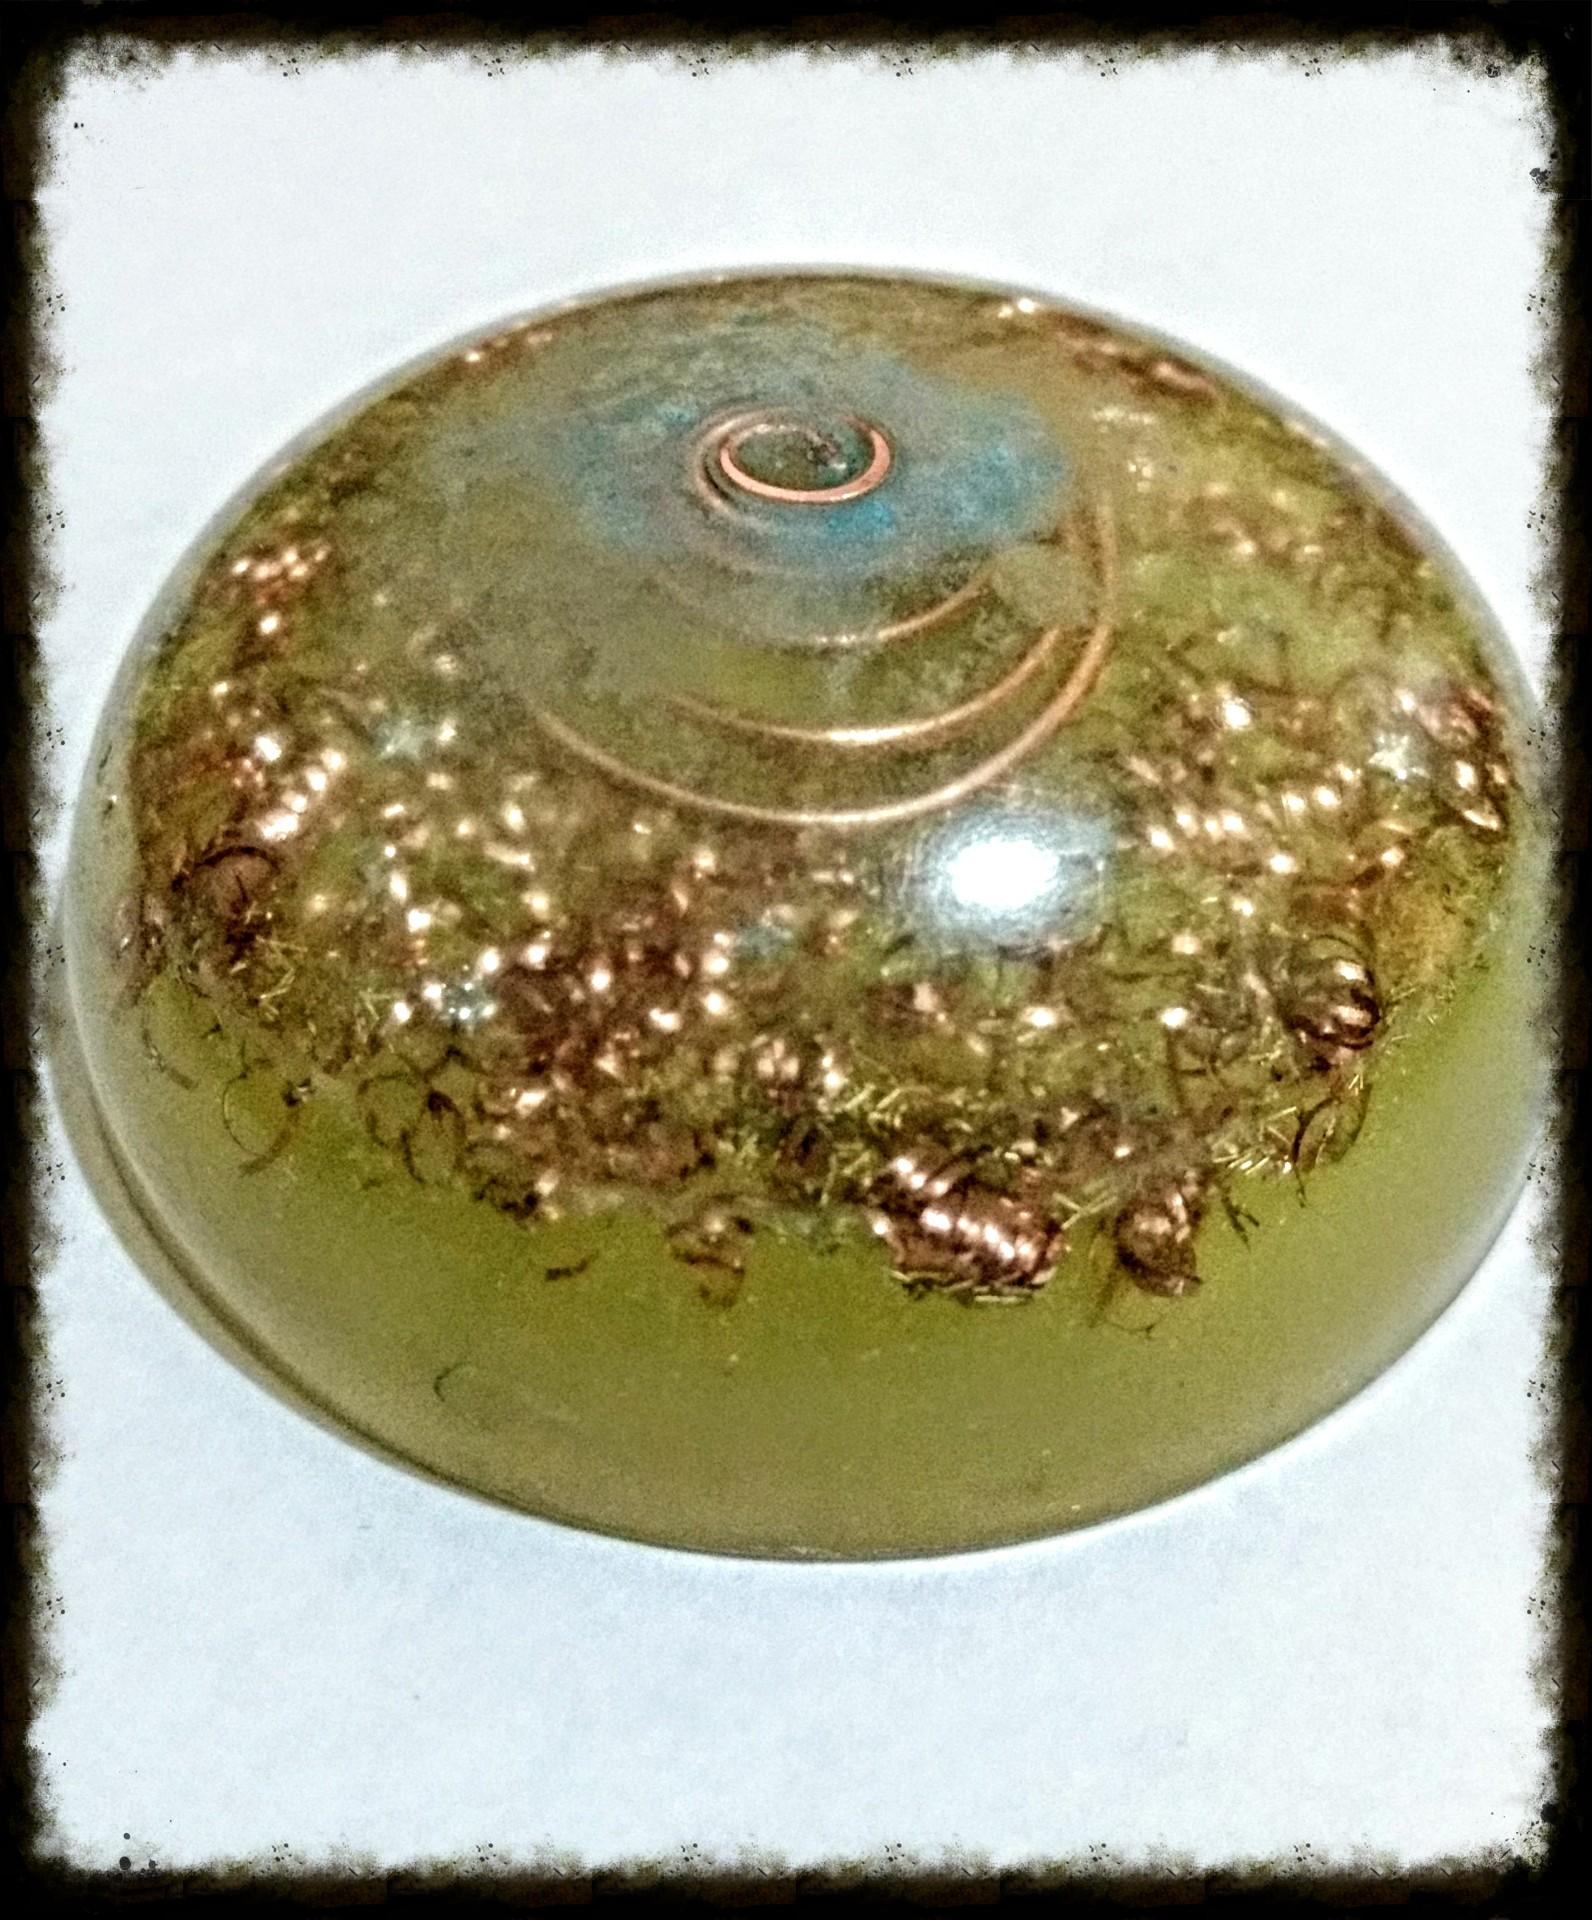 1/2 Esfera de Orgonita luminica, cobre, cuarzo cristal, y cobre